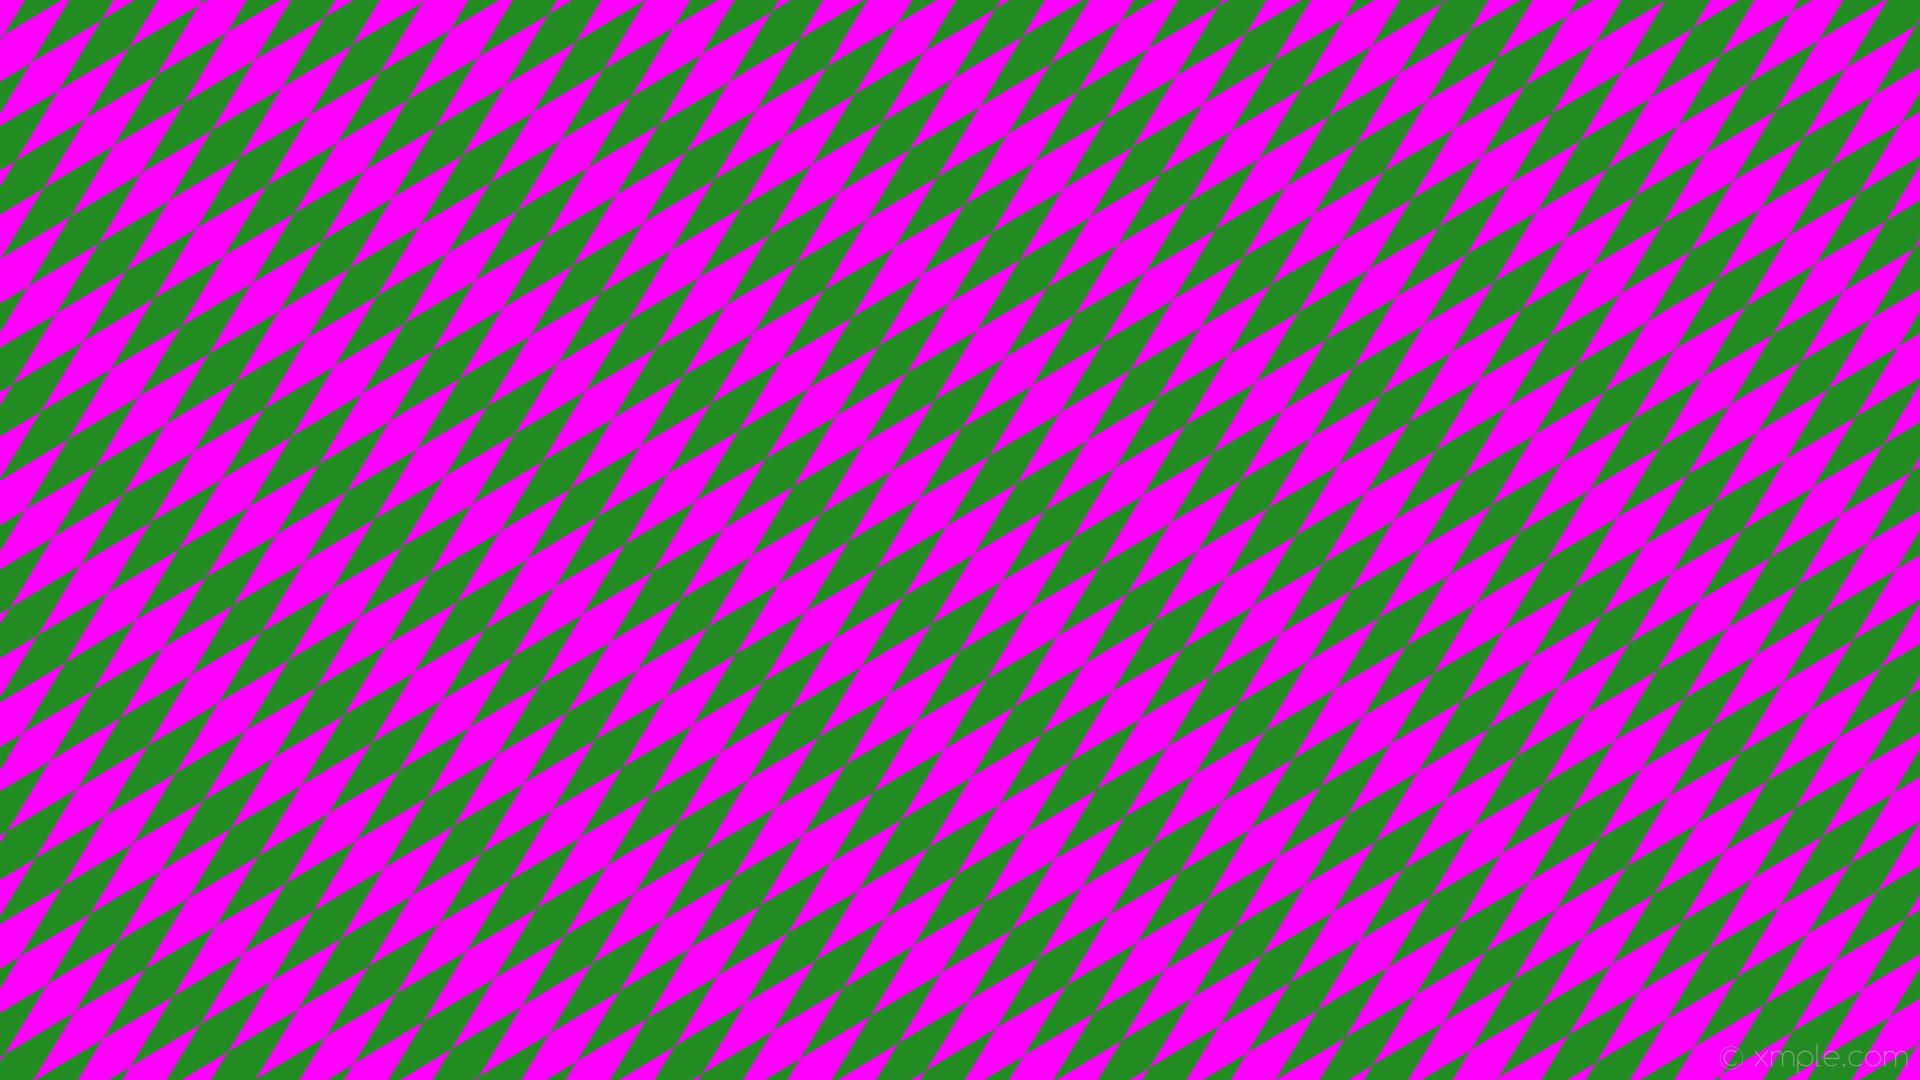 wallpaper rhombus purple diamond lozenge green magenta forest green #ff00ff  #228b22 45° 160px